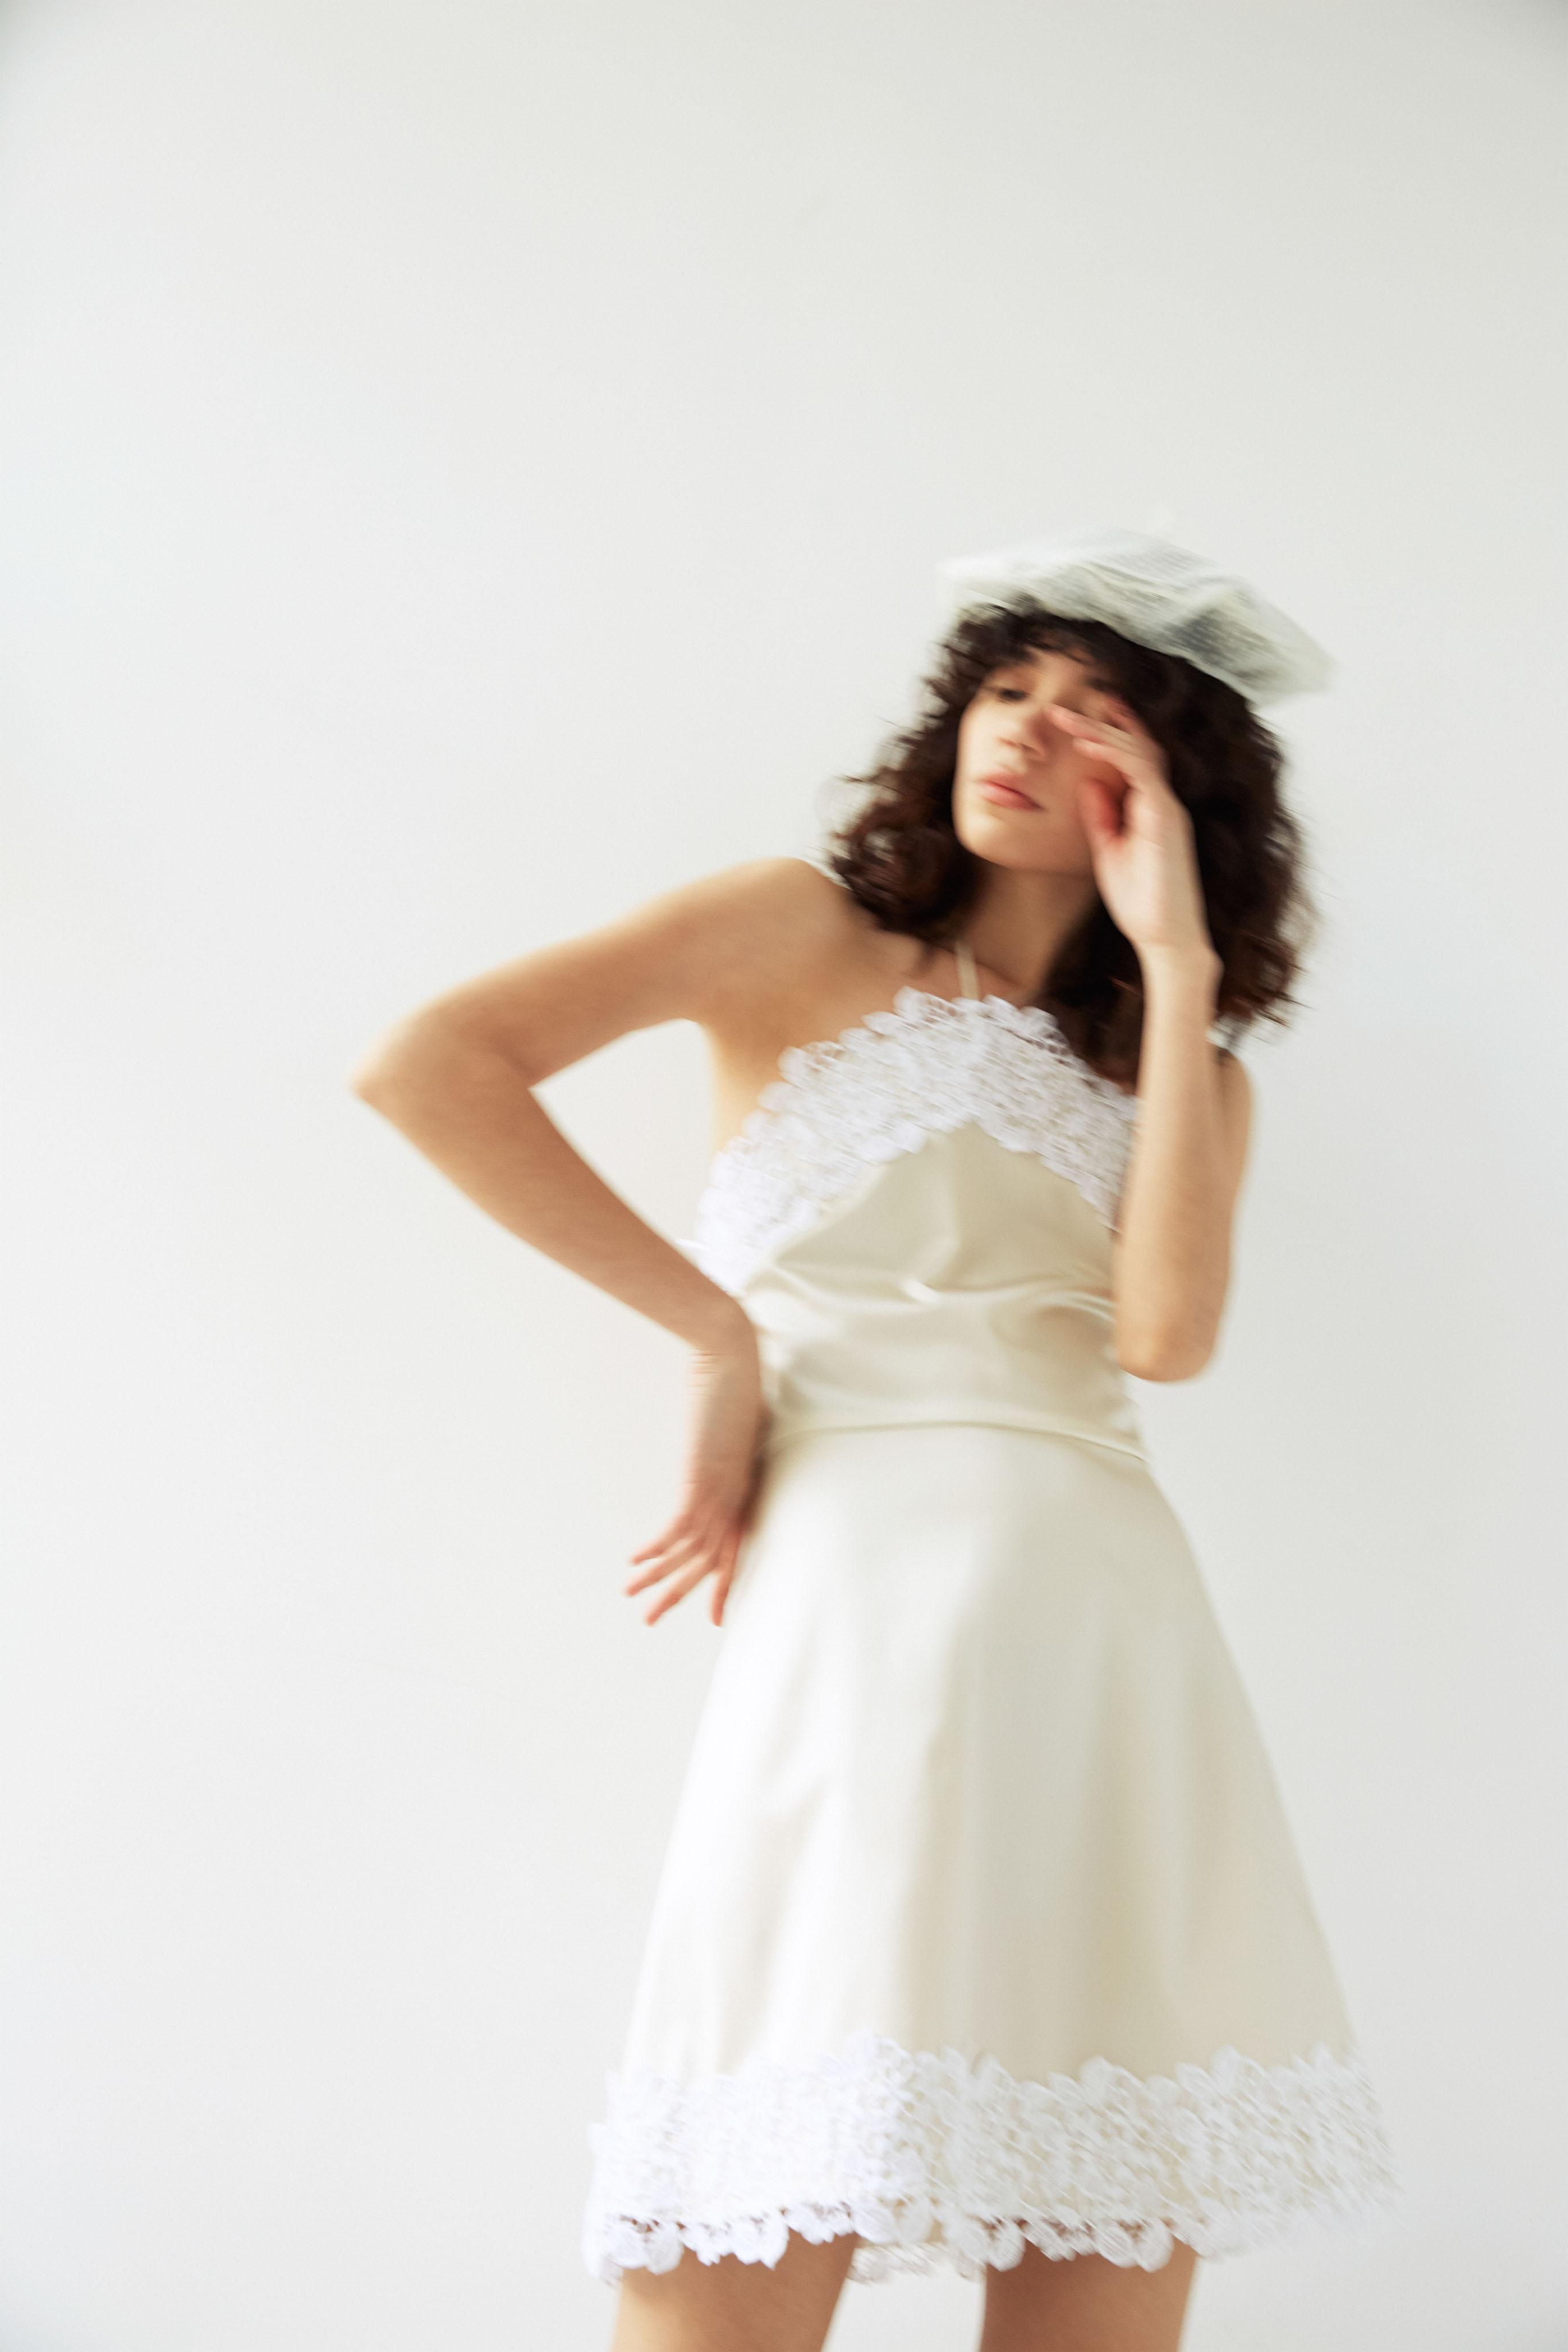 lein wedding dress spring 2020 short silk dress with lace trim